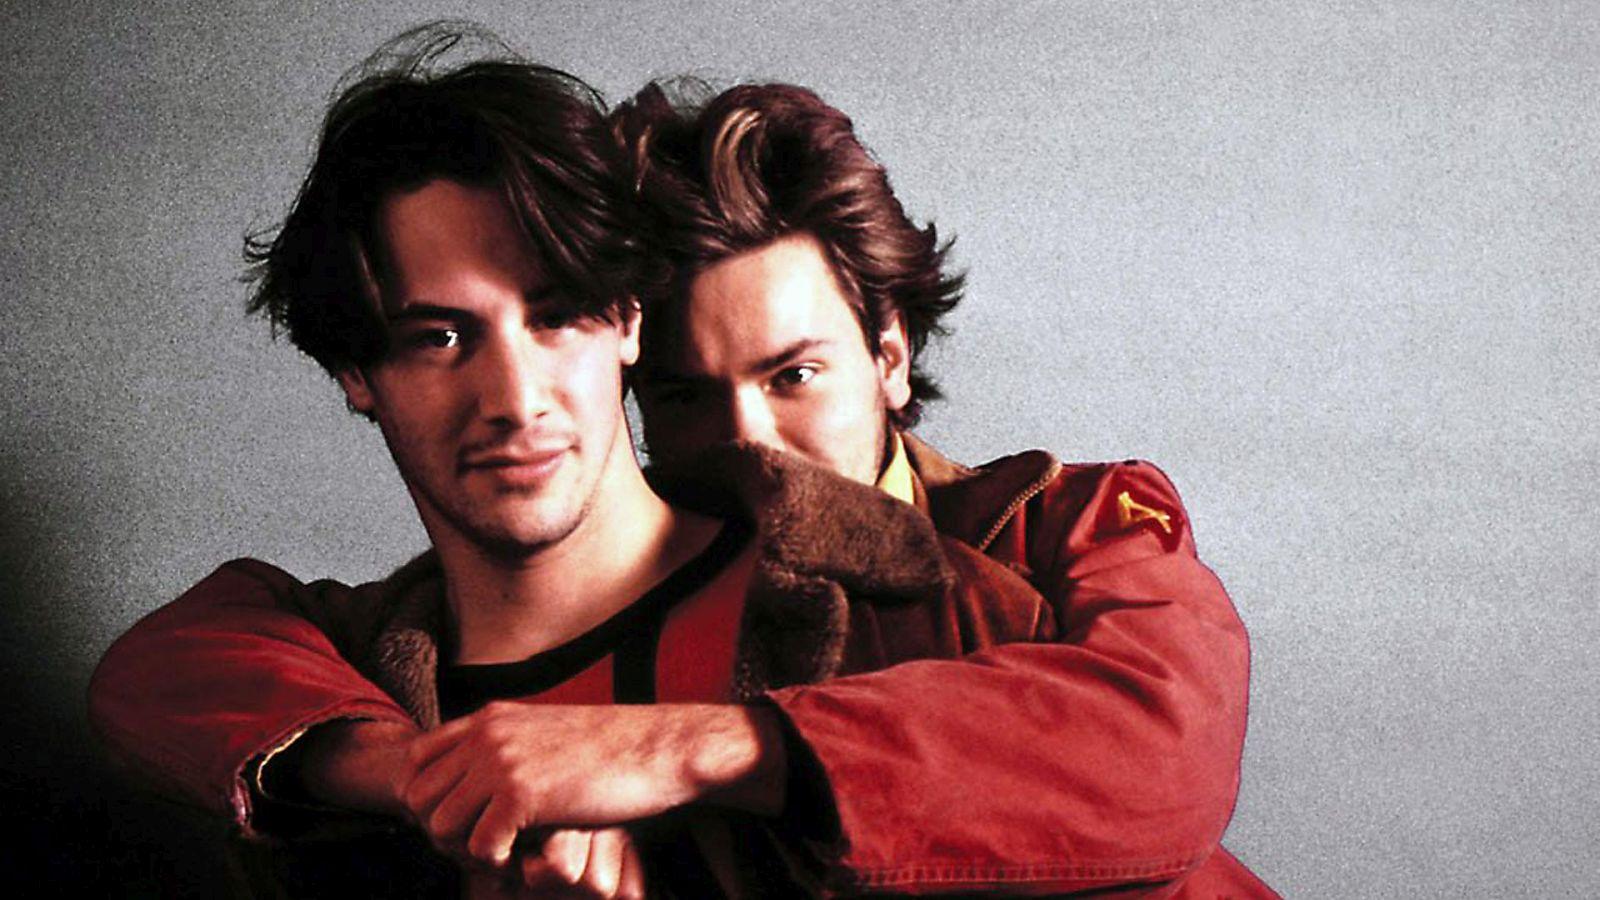 Belli e dannati: River Phoenix e Keanu Reeves in un'immagine promozionale del film